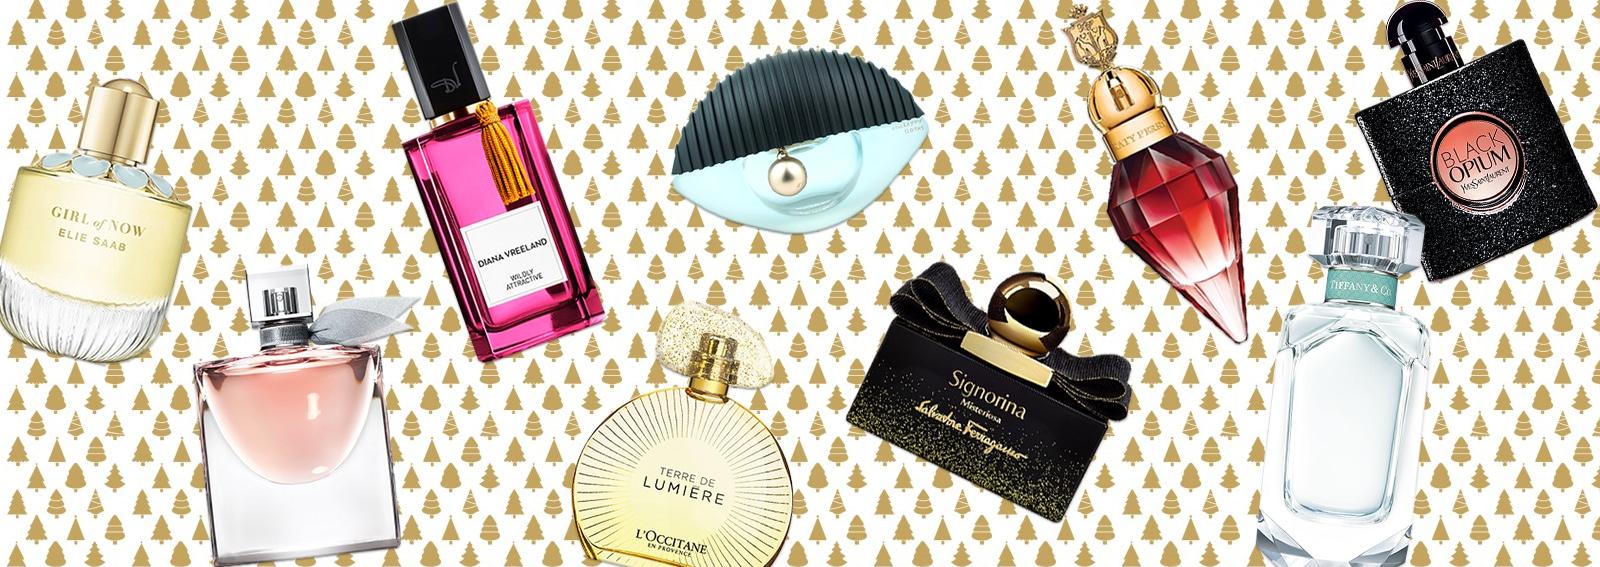 cover-regali natale per lei profumi-desktop